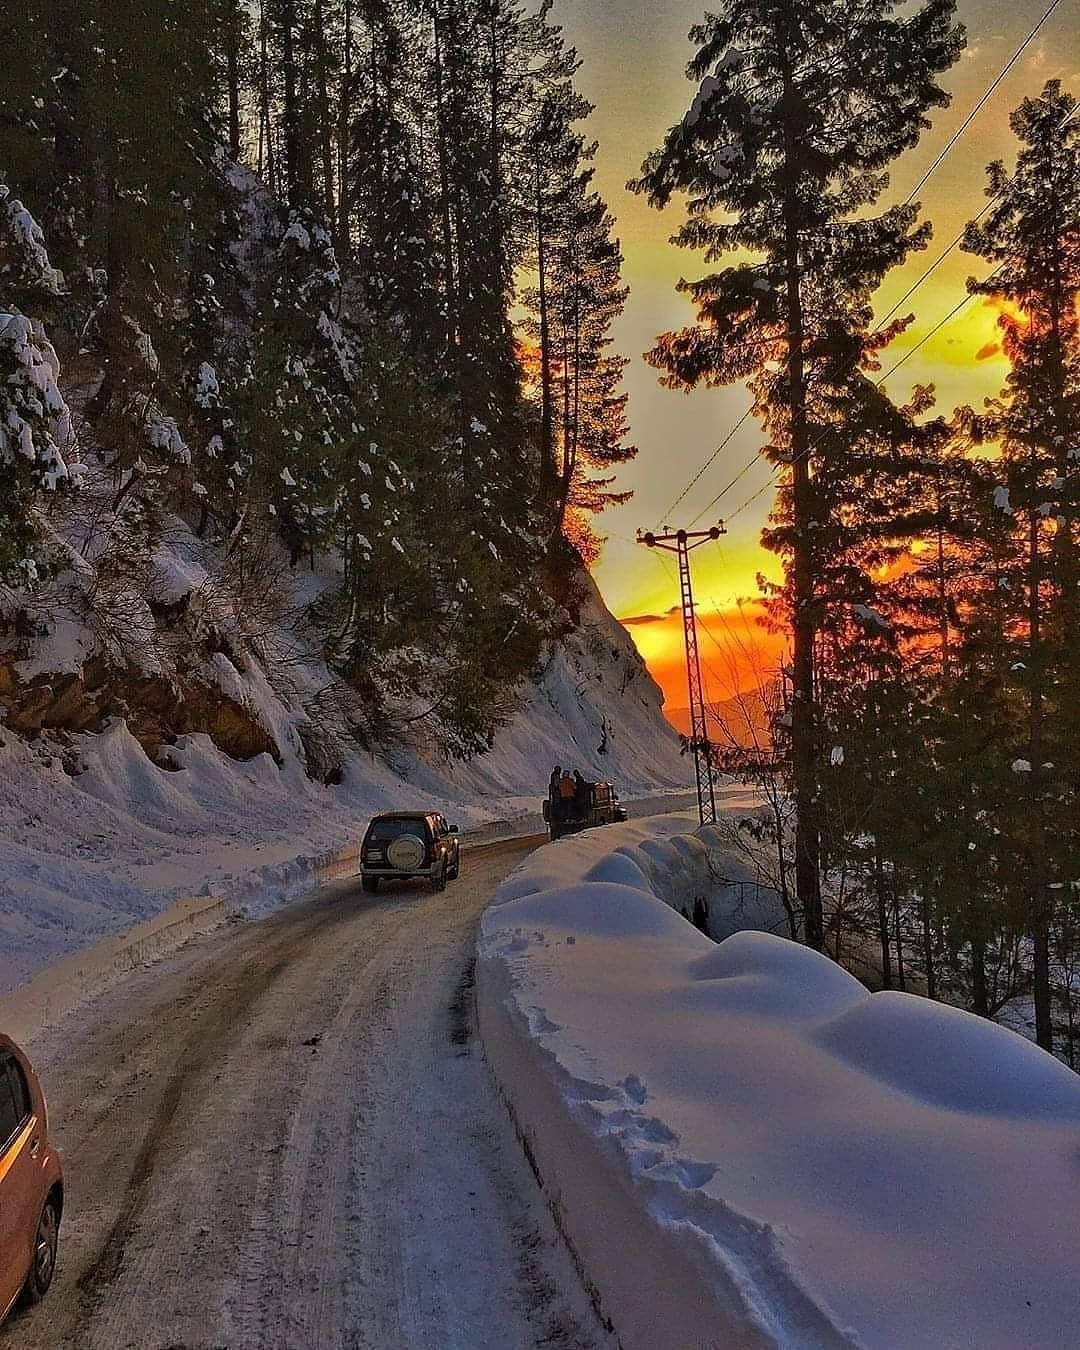 Sunset. Nathiagali, KPK.  Check out @thehunzashop.pk Comment your thoughts💙  Captured by :📸 Junaid Use our hashtag To get Featured : #DestinationPakistan https://t.co/D2cCKDrBQG